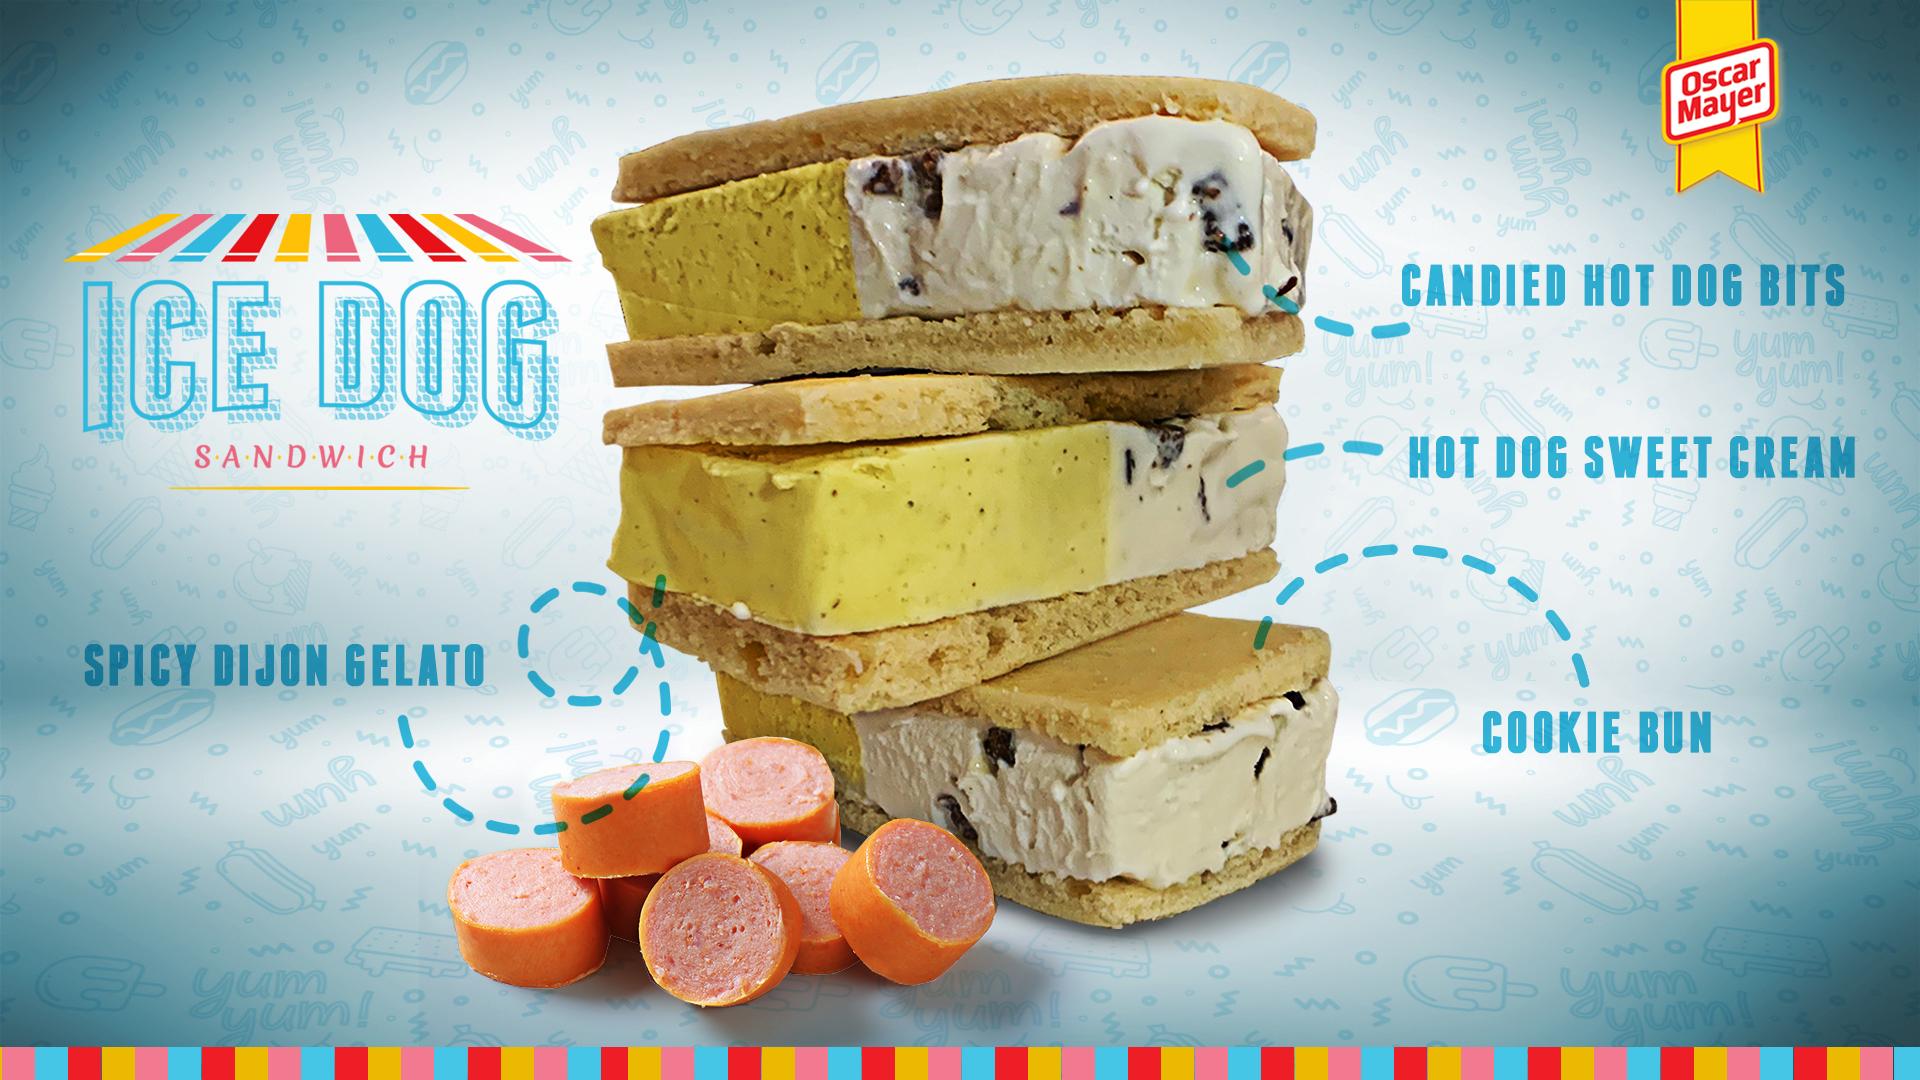 Oscar Mayer's Hot Dog Ice Cream